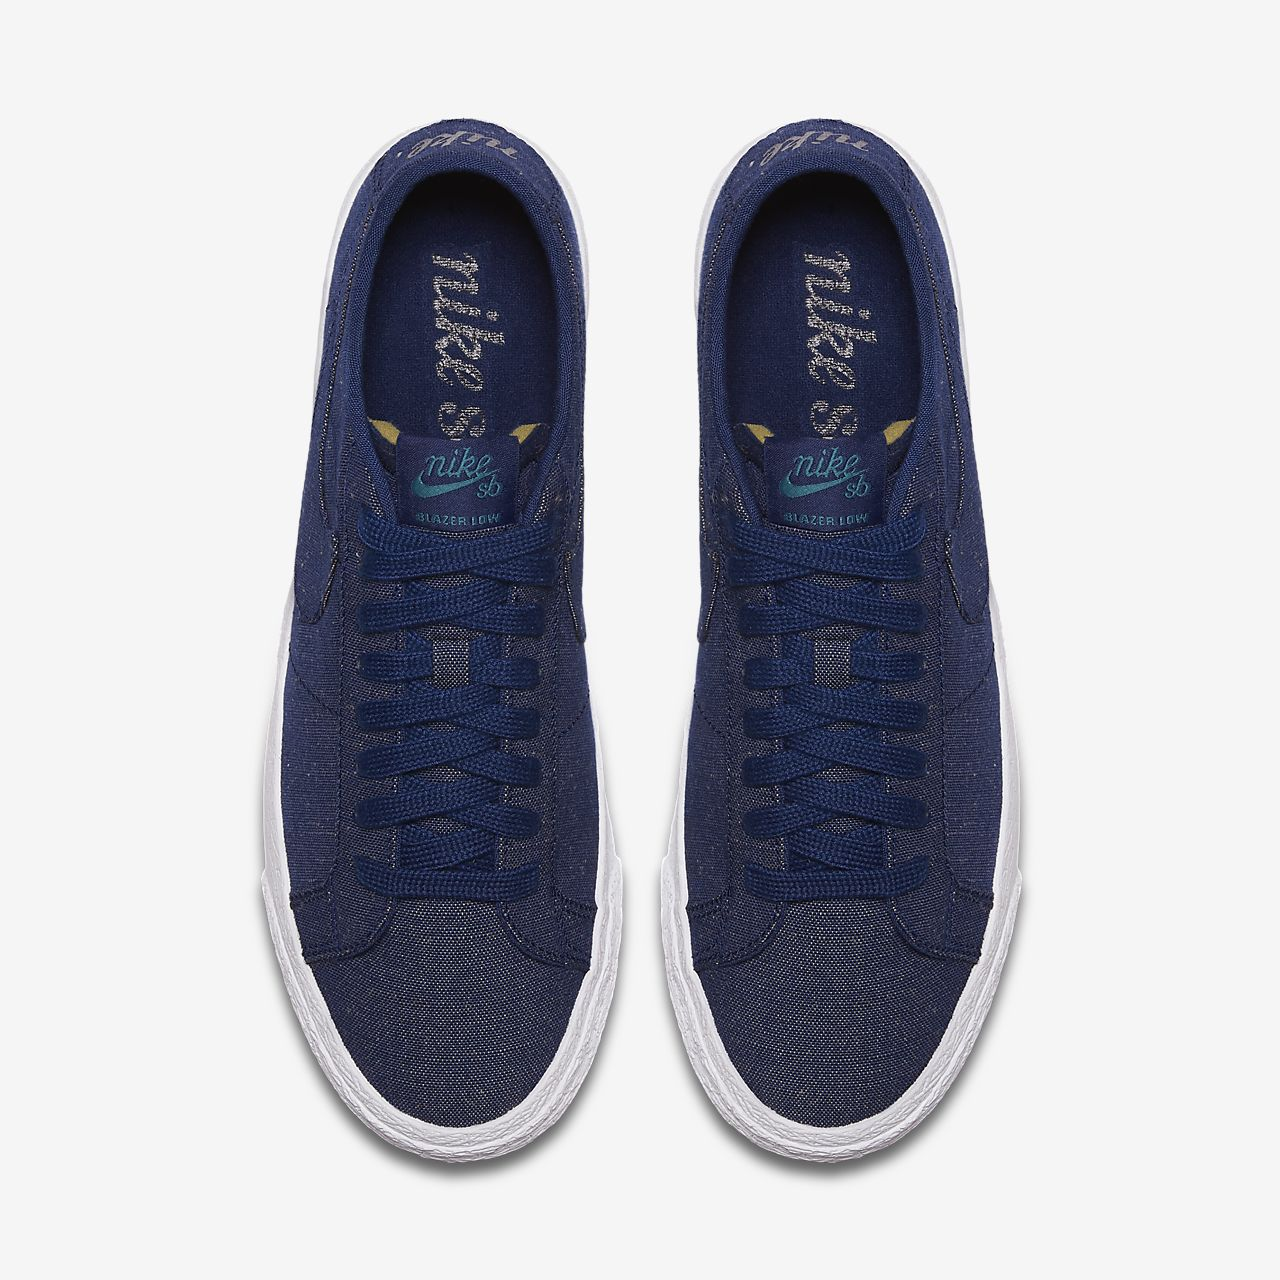 best loved 48241 0ca85 ... Nike SB Zoom Blazer Low Canvas Deconstructed Men's Skateboarding Shoe